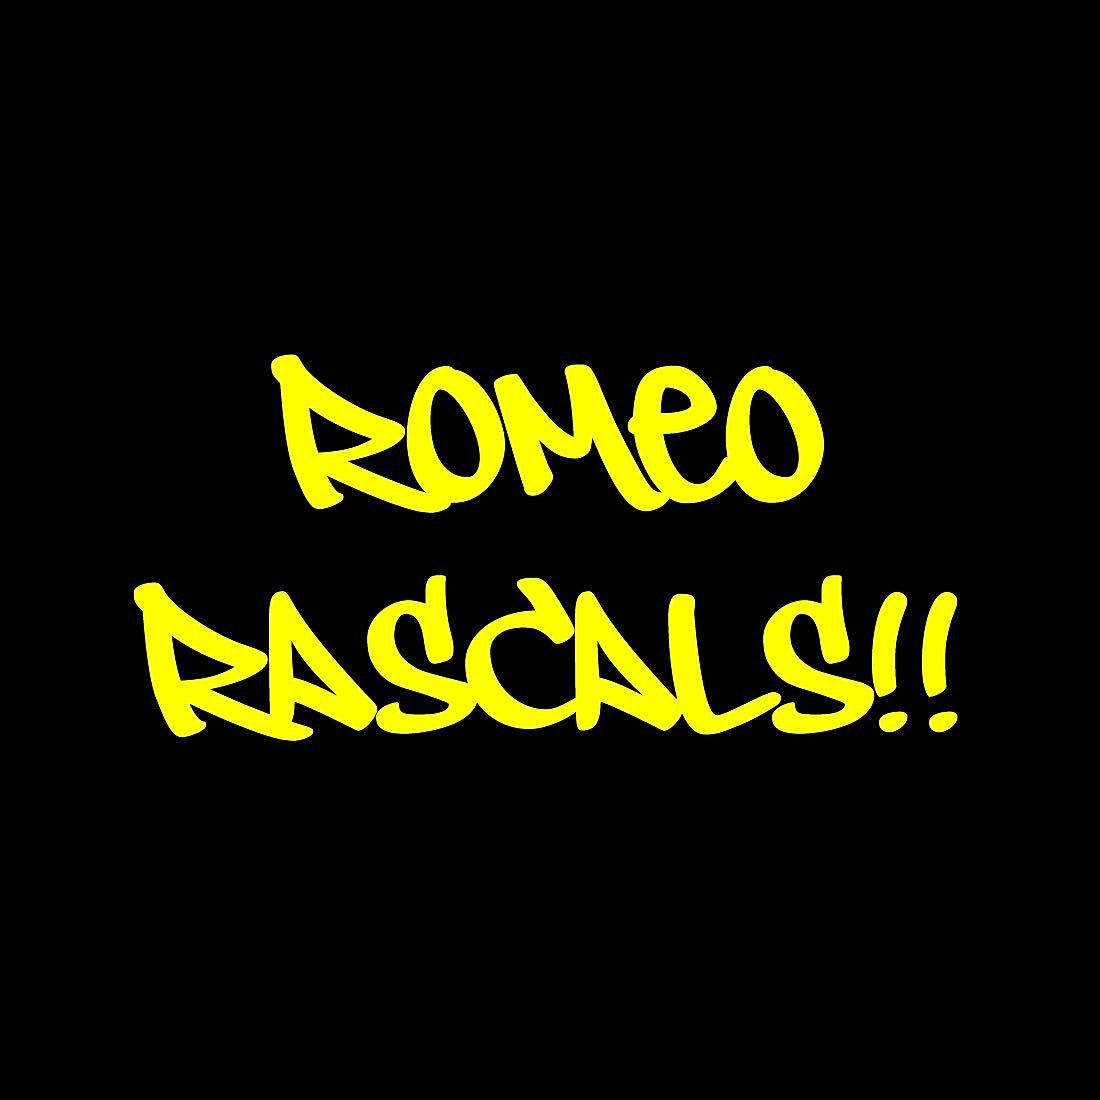 Romeo Rascals #1, 23 April | Event in Ipswich | AllEvents.in